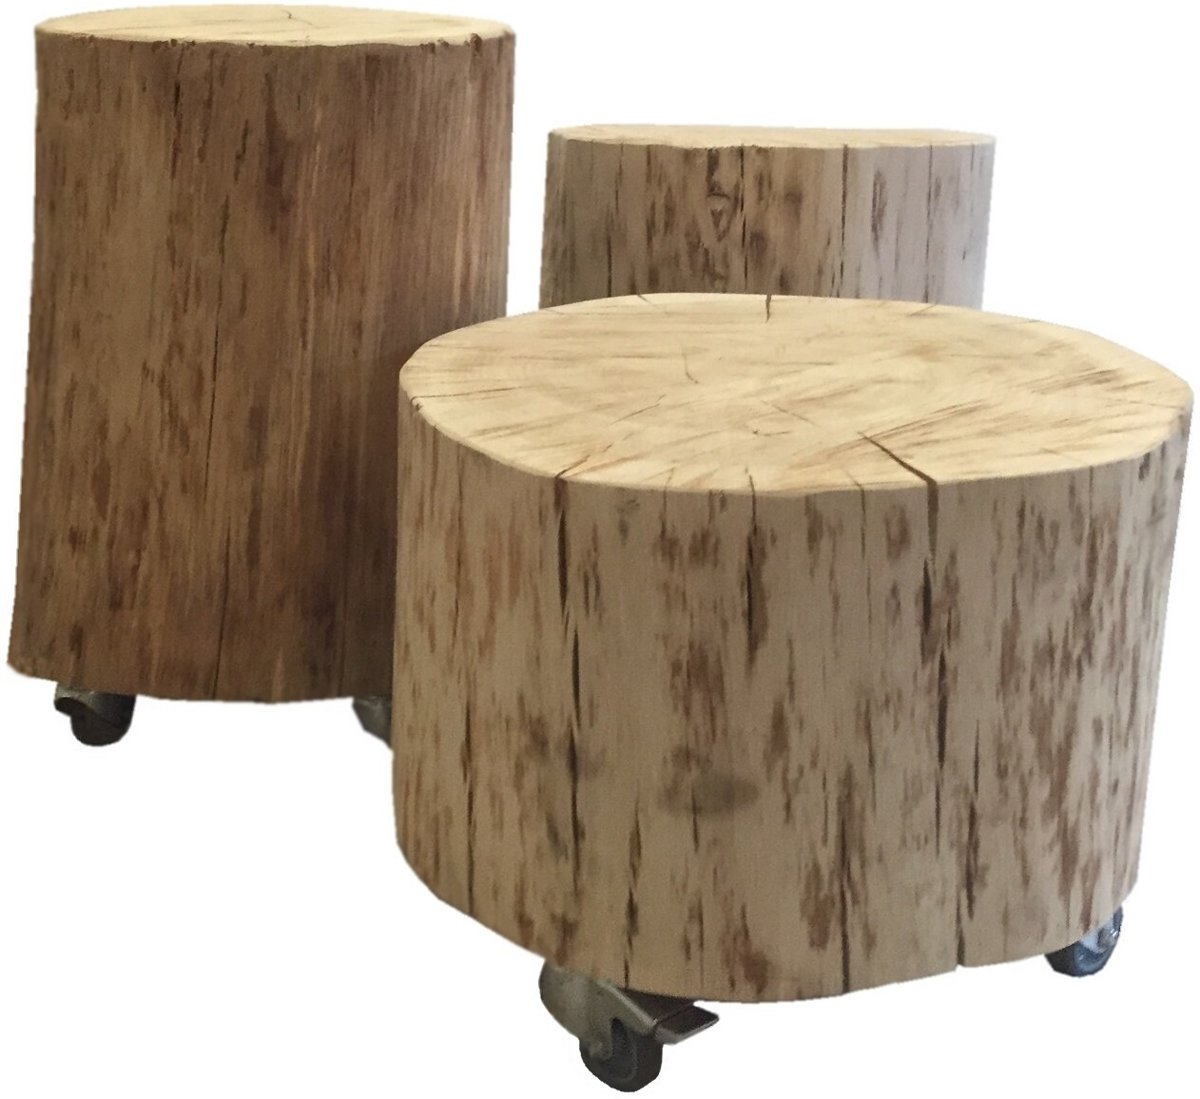 New bol.com | Stoereplanken Romee Bijzettafels - Boomstam meubels #VP73